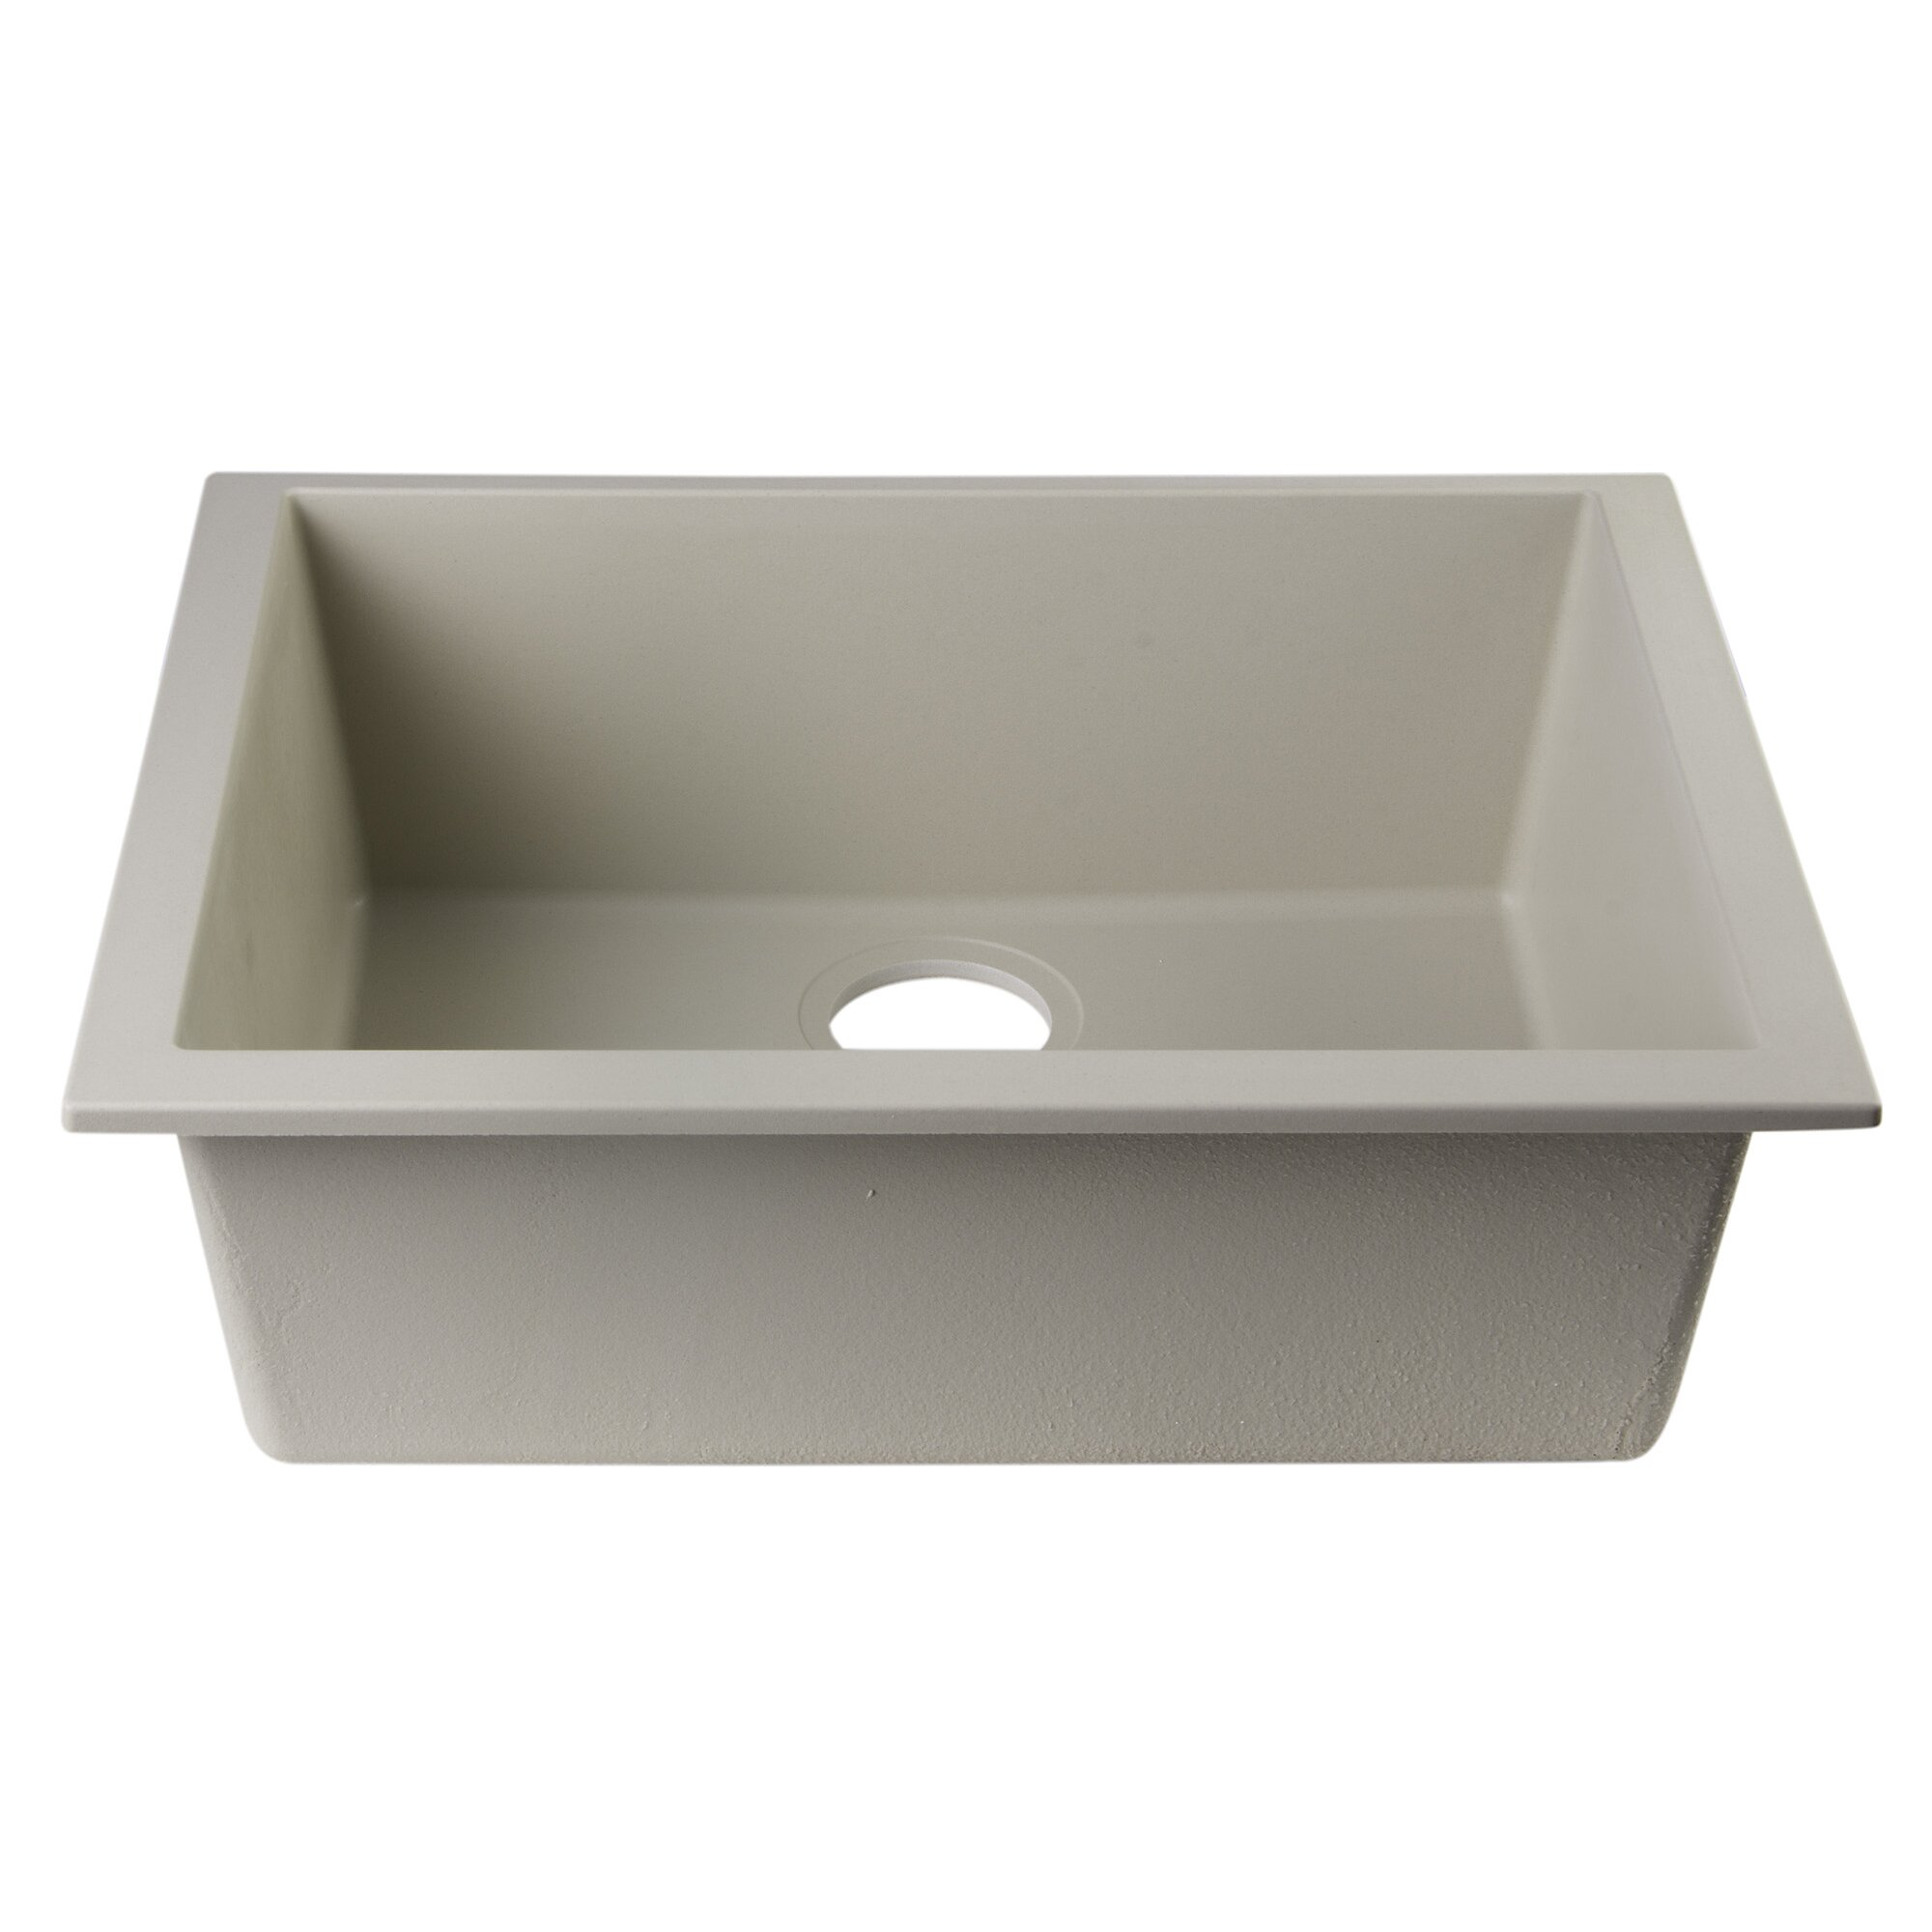 alfi brand 23 63 quot x 17 75 quot undermount single bowl kitchen